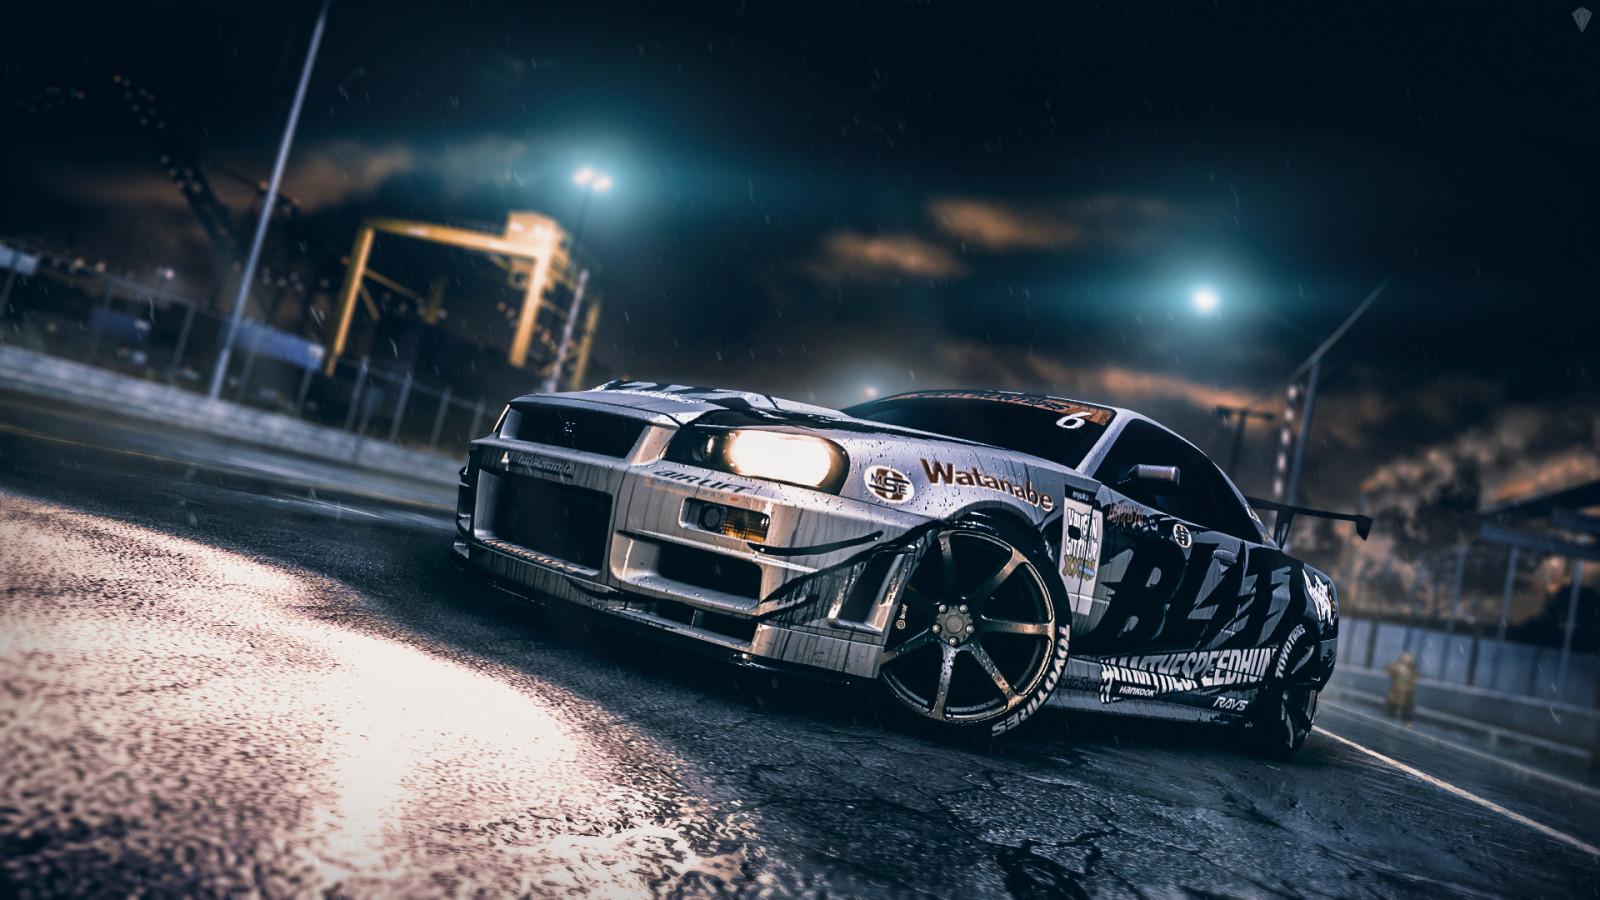 Racing Car Wallpaper 1080p Wallpaper Night Bmw Rain Skyline Nissan Playstation